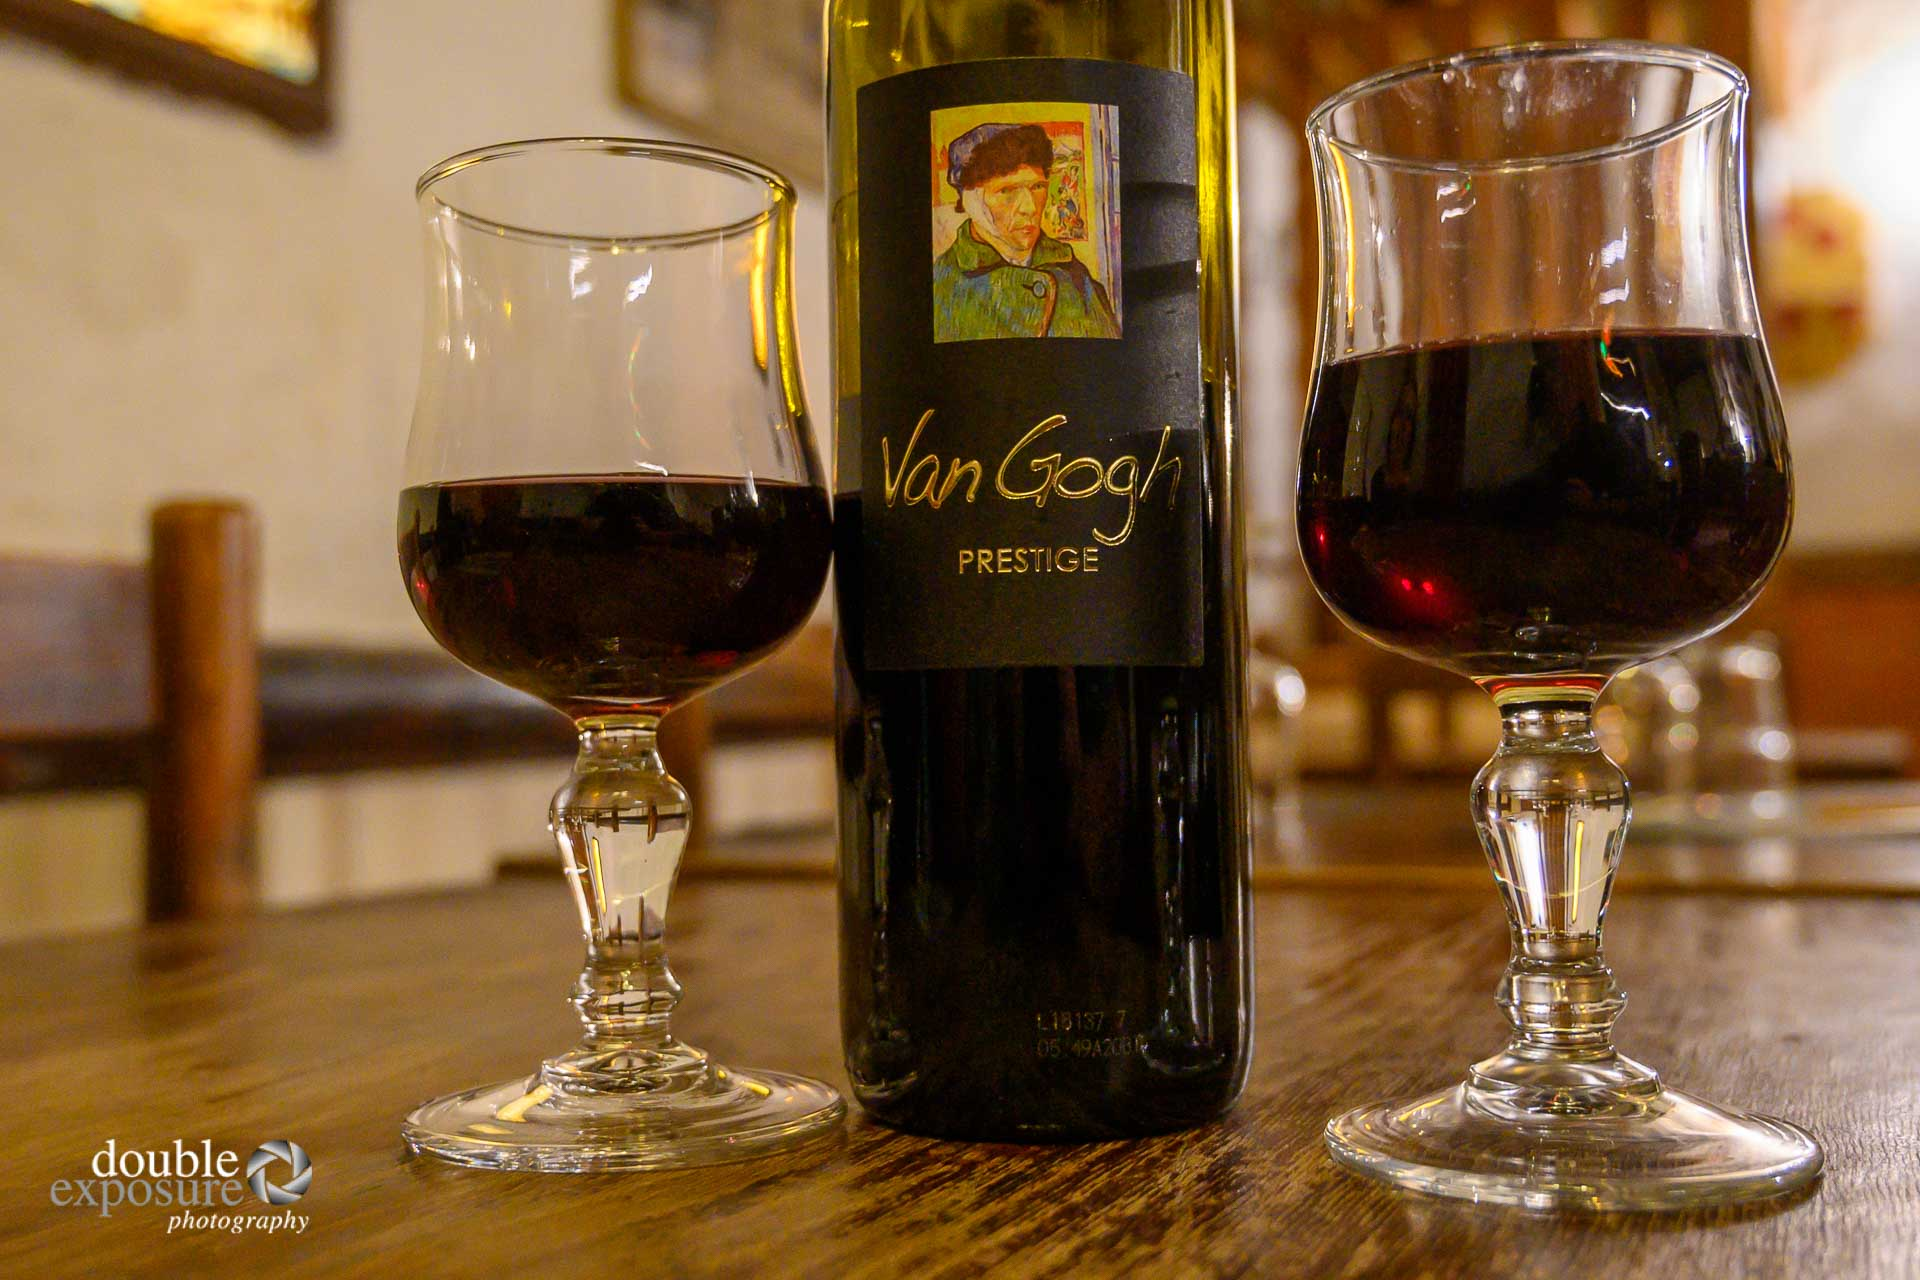 A bottle of Van Gogh wine.